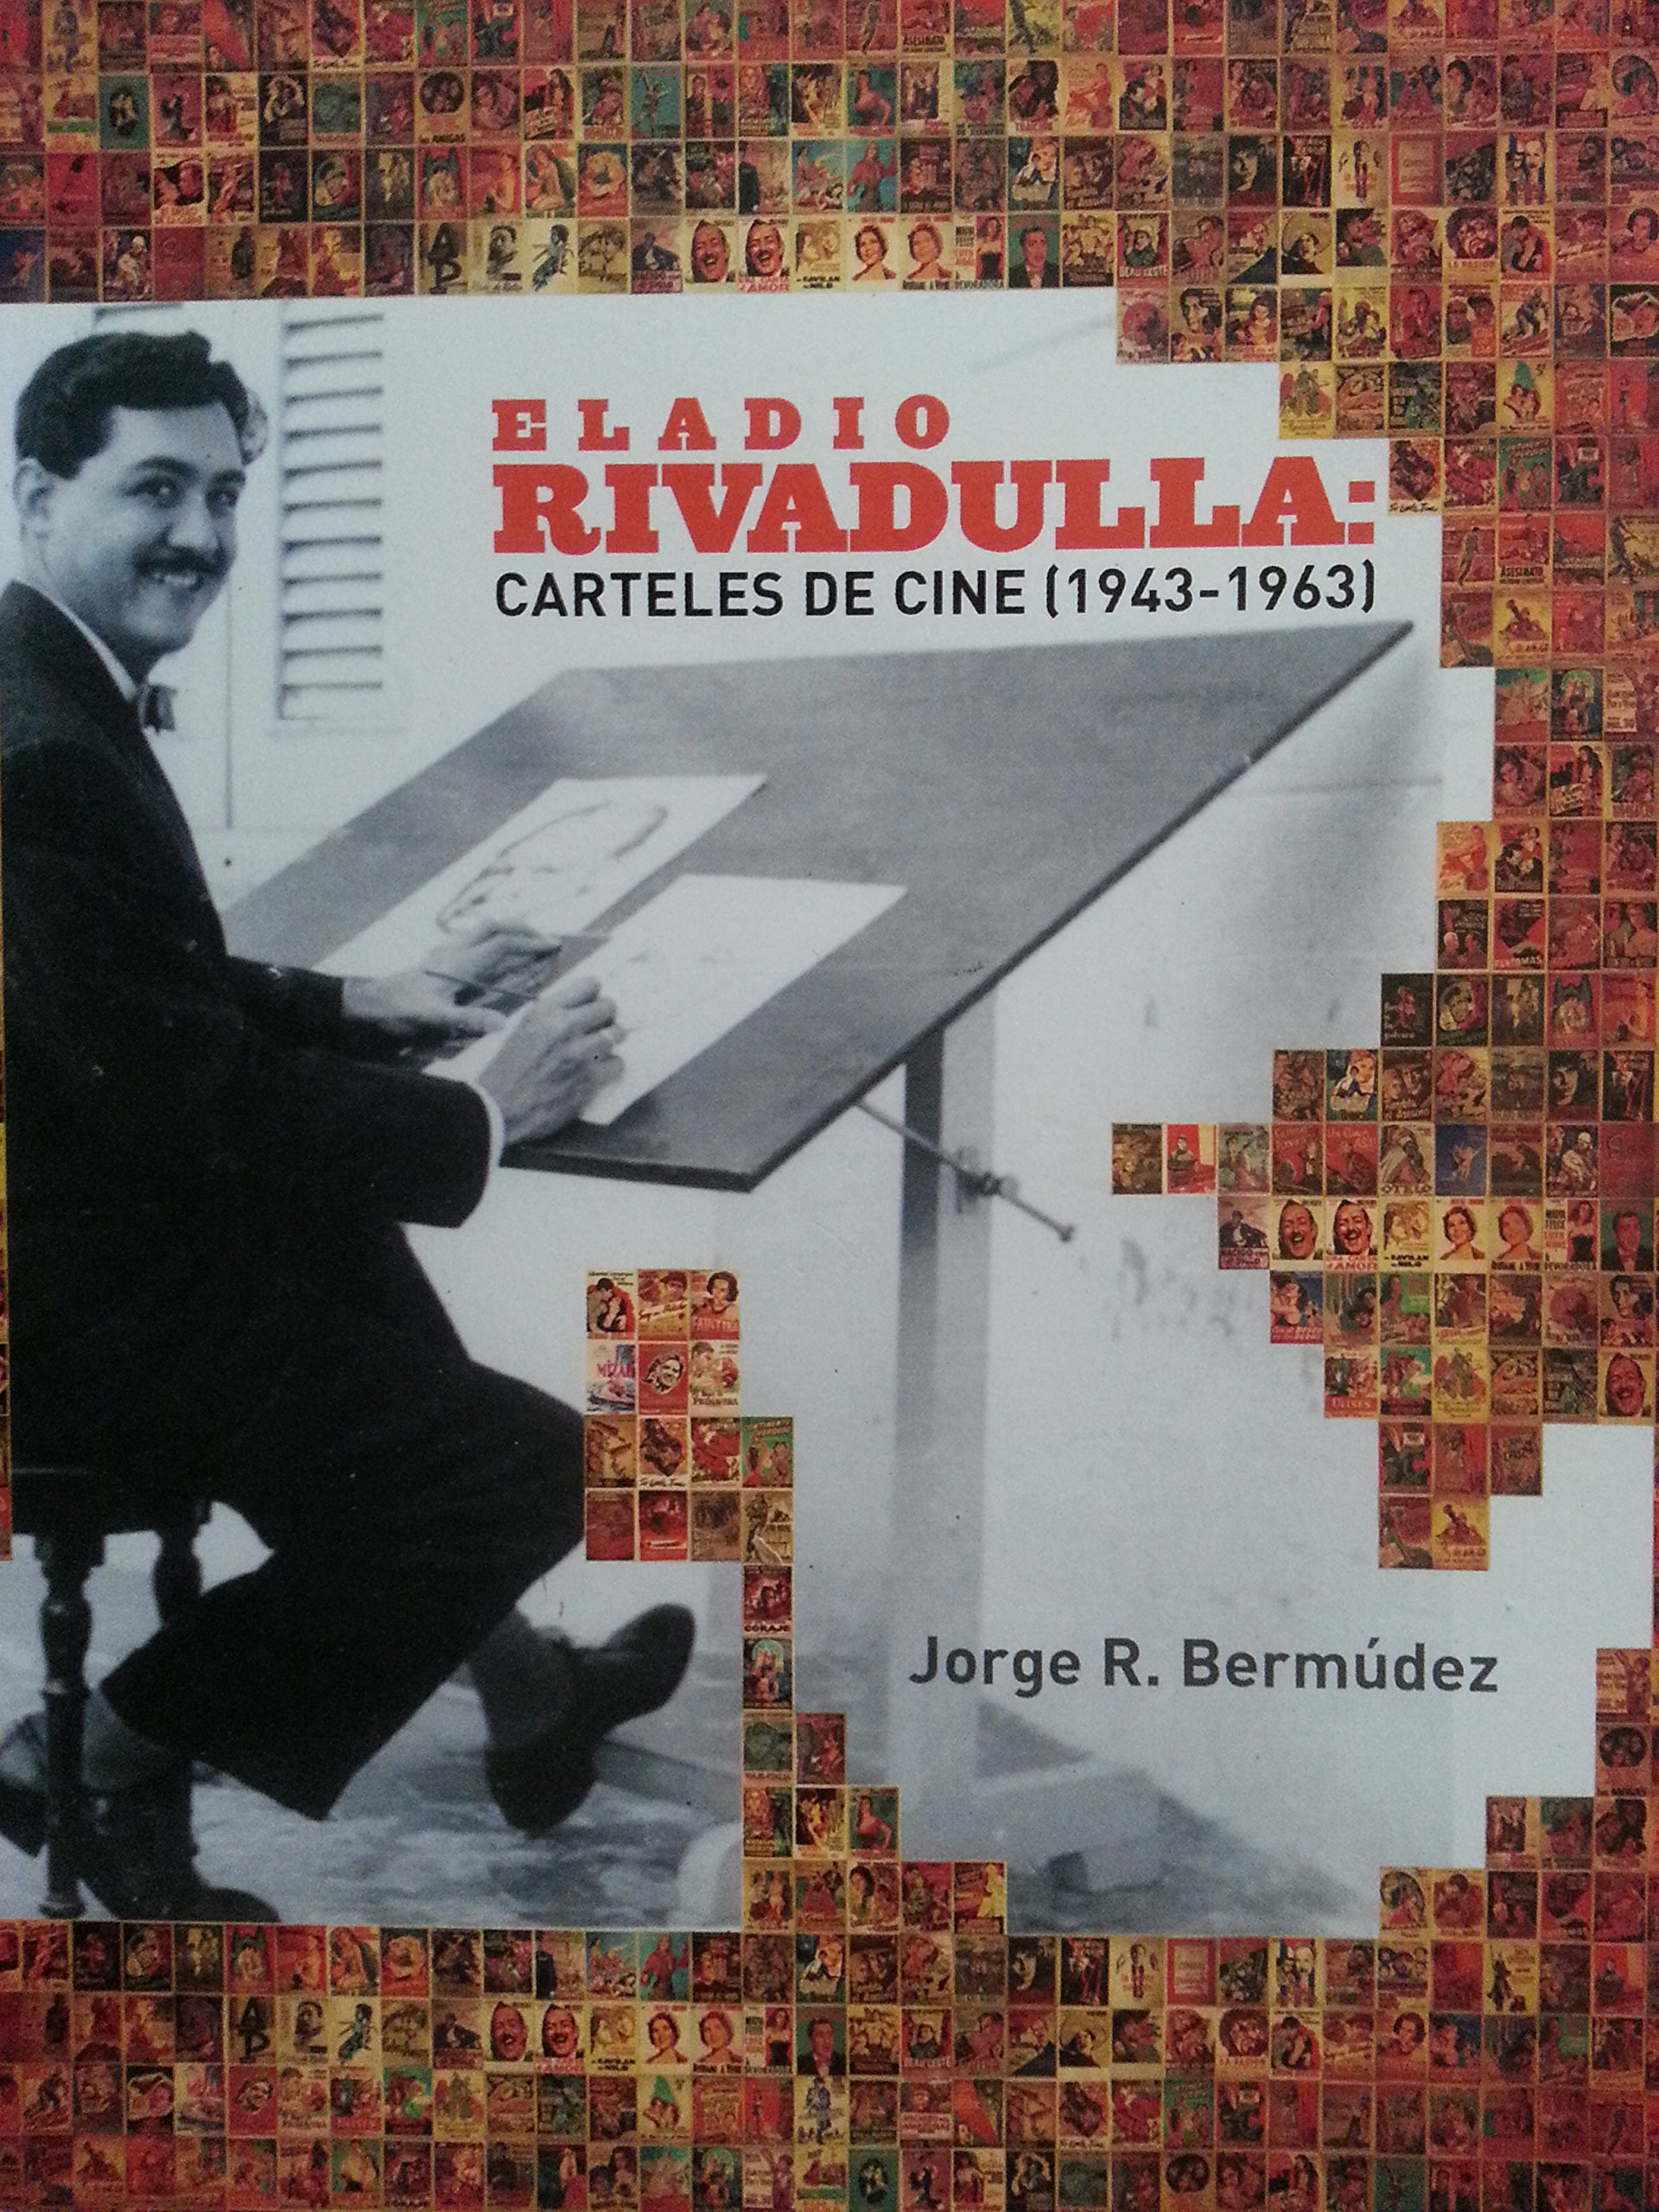 Eladio Rivadulla.carteles De Cine.1943-1963.: jorge r ...